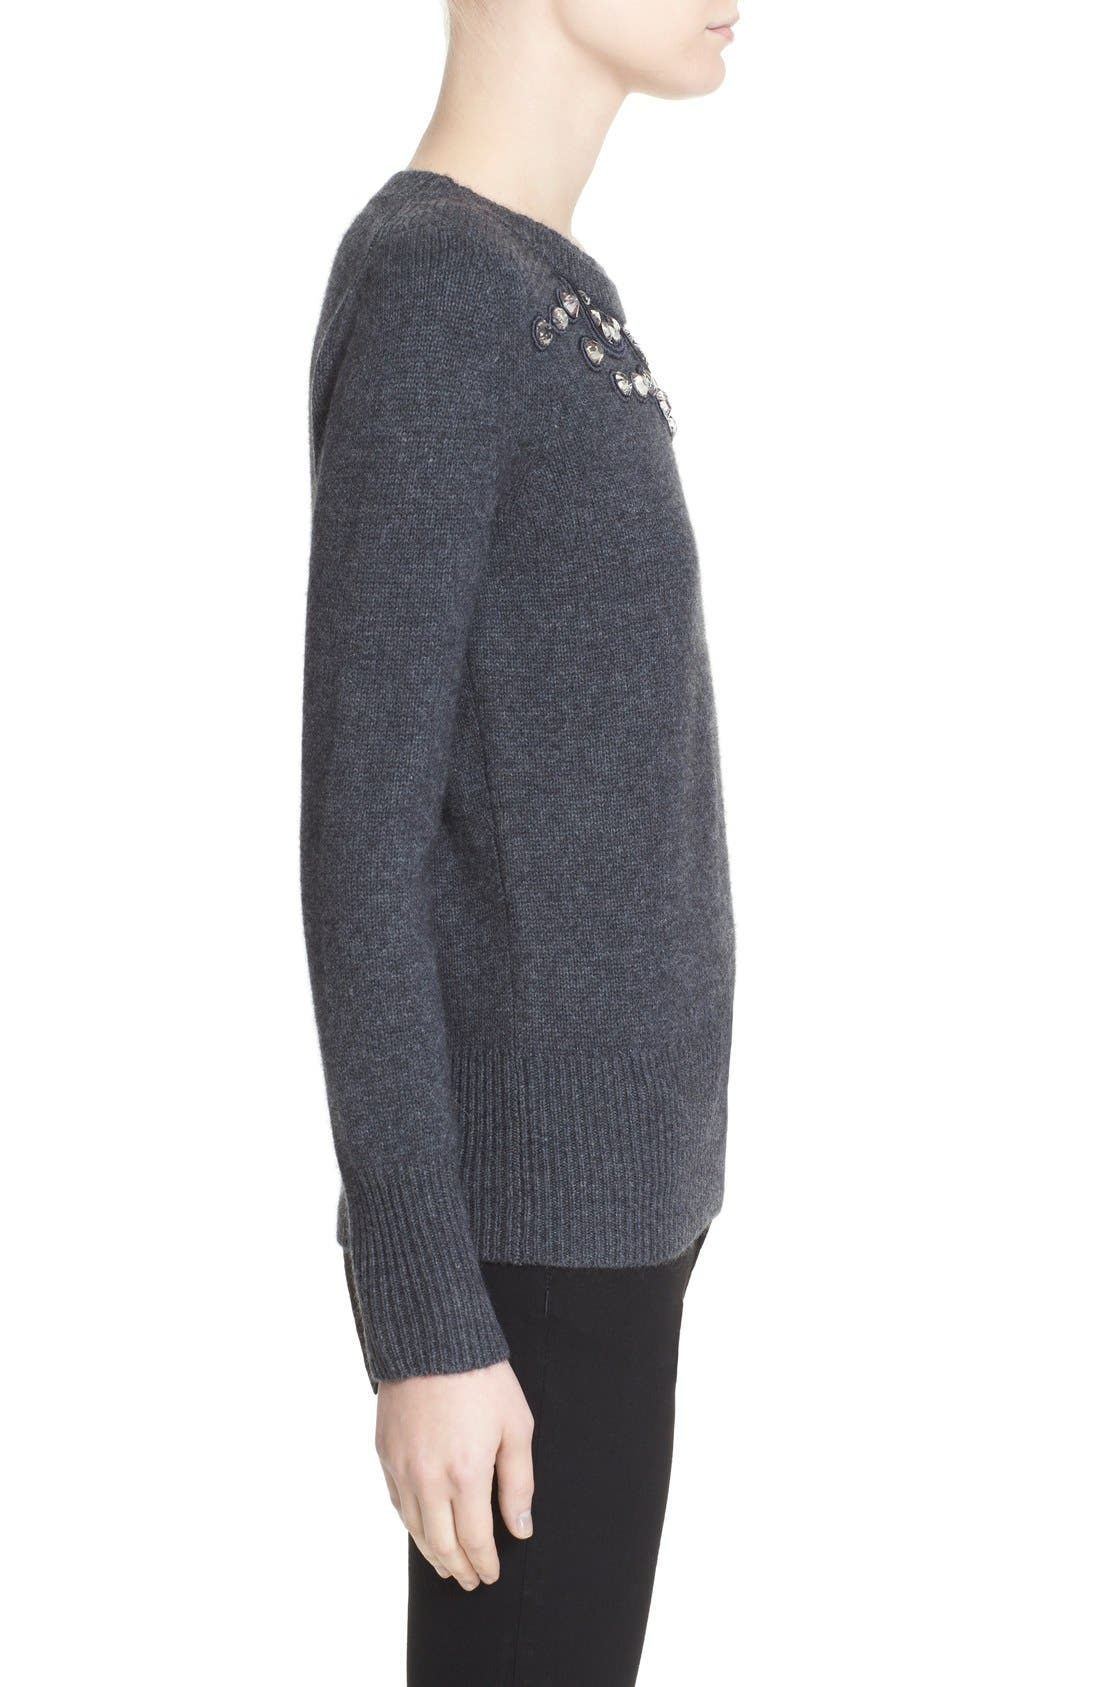 BURBERRY LONDON,                             Embellished Crewneck Sweater,                             Alternate thumbnail 4, color,                             026